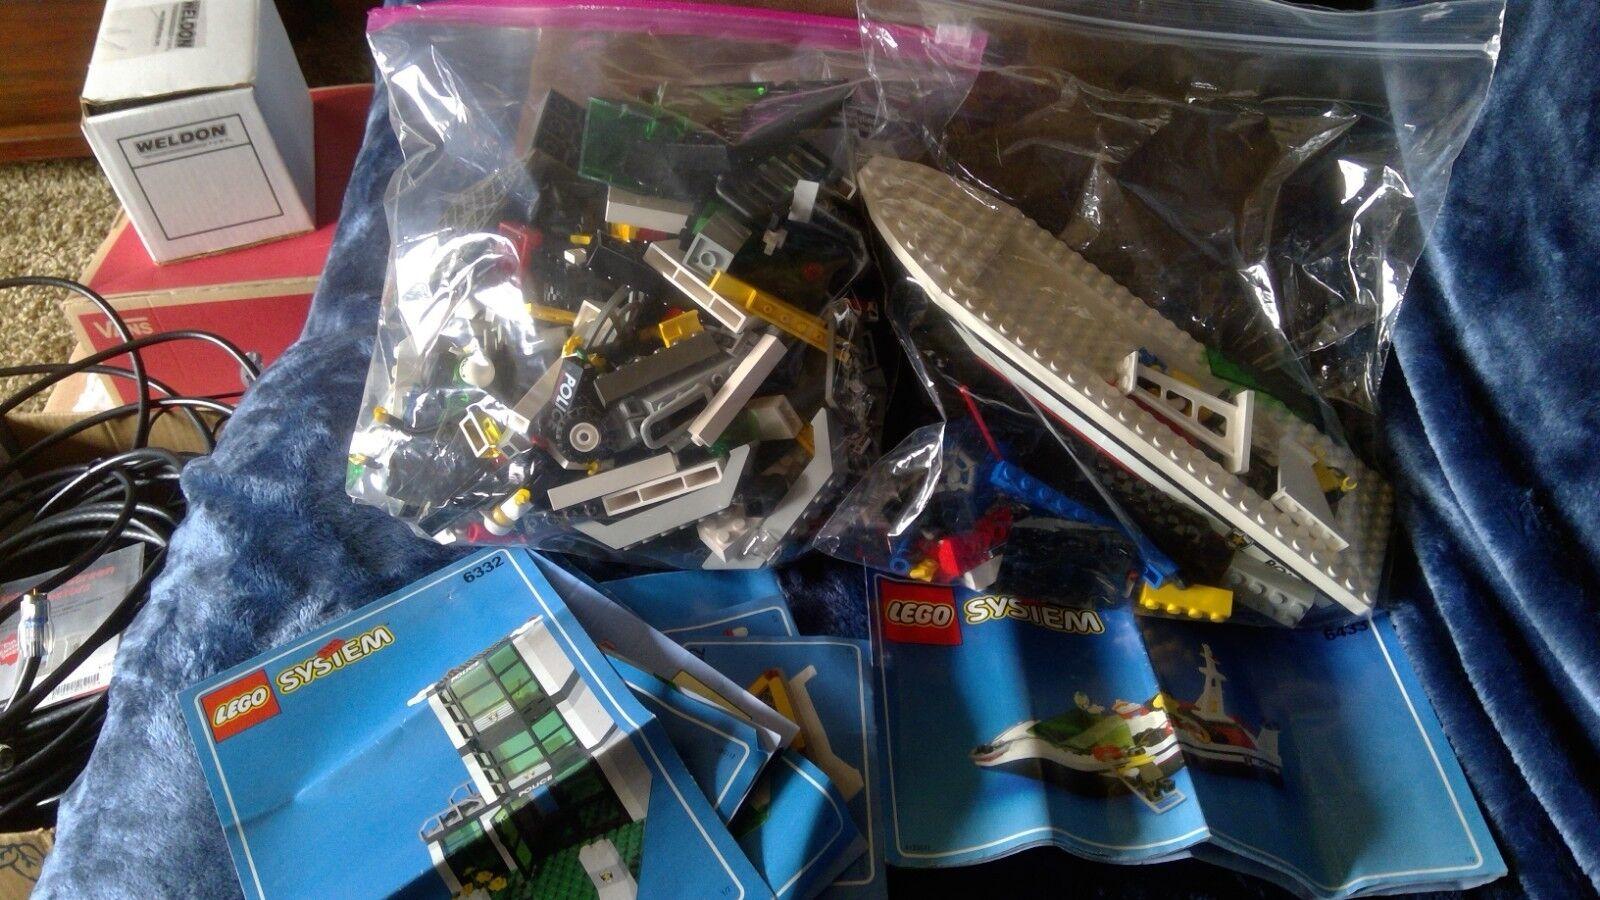 LEGO 6332 - 1998 Police Station & LEGO 6433 - 1999 Police Boat NO BOX w/Instruct